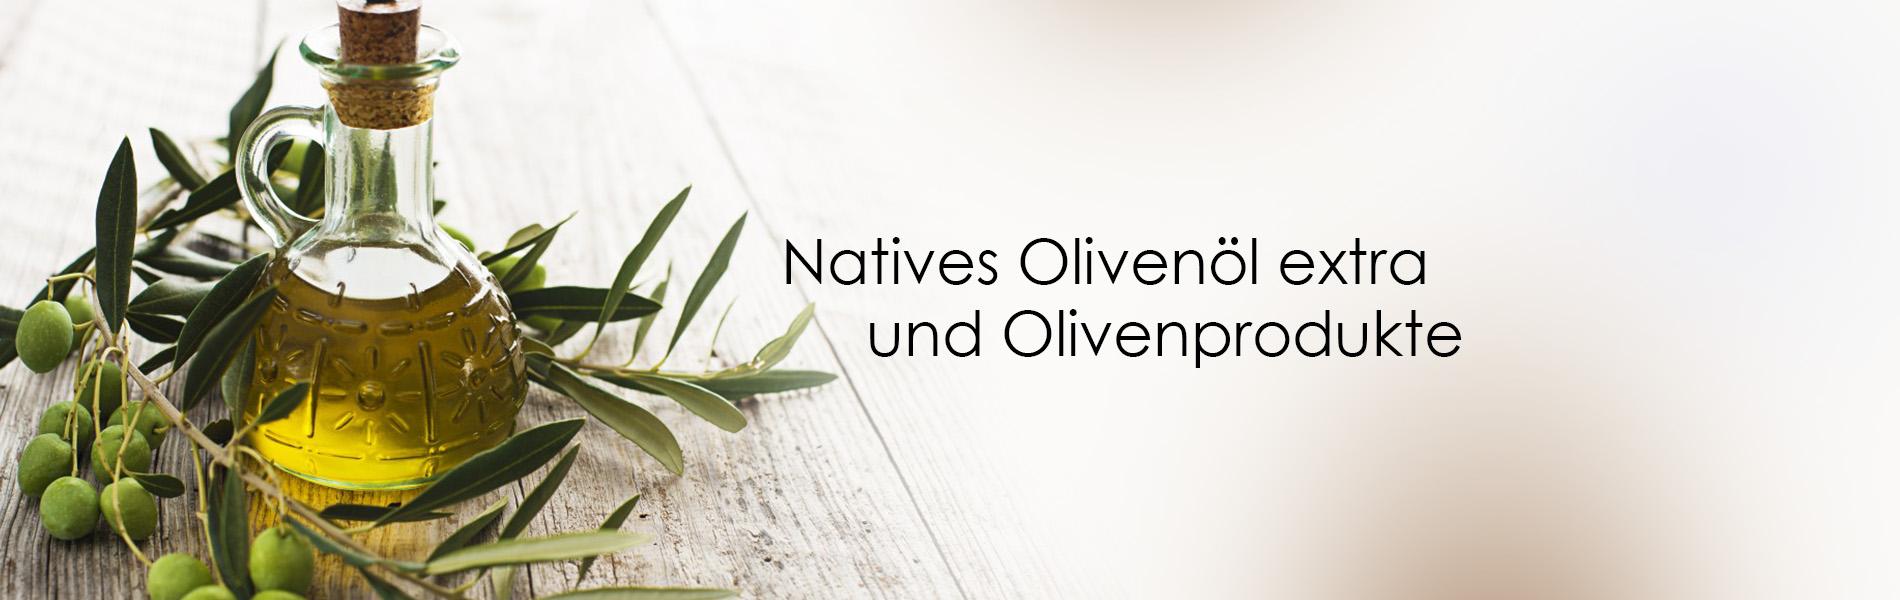 1900x600-olivenol-slider-03